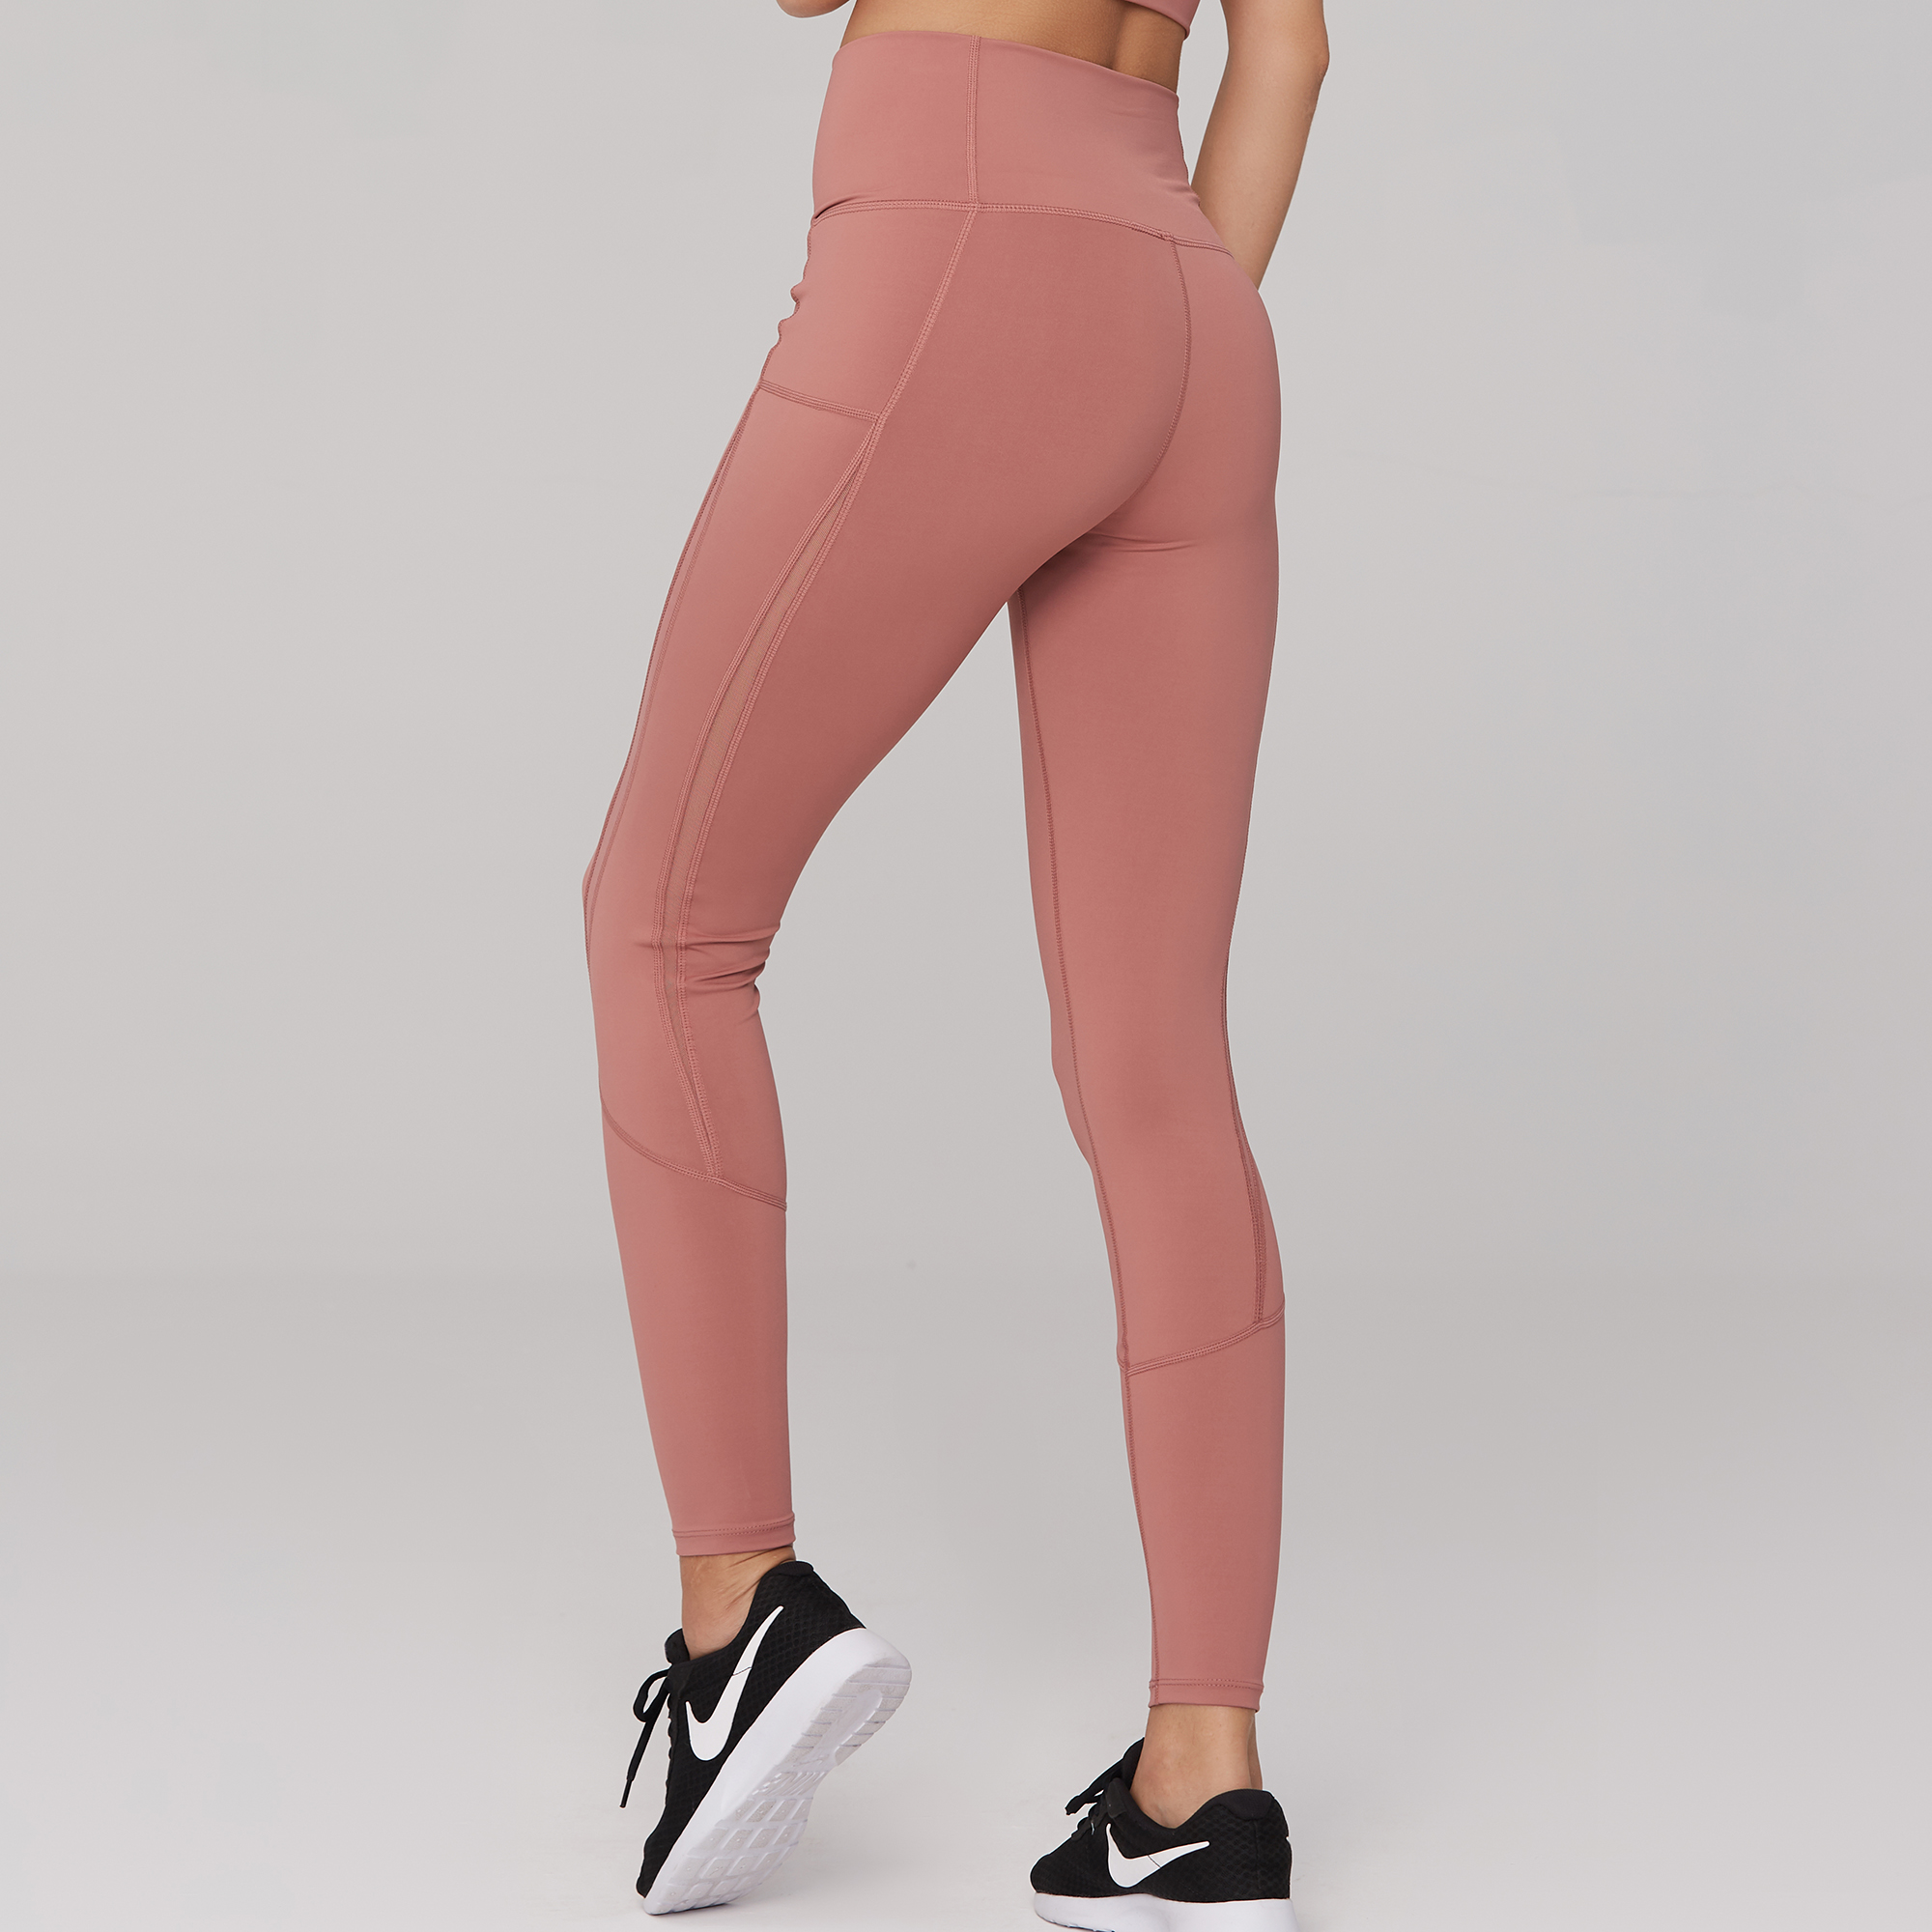 Custom high waist gym yoga pant womens fitness sport leggings фото